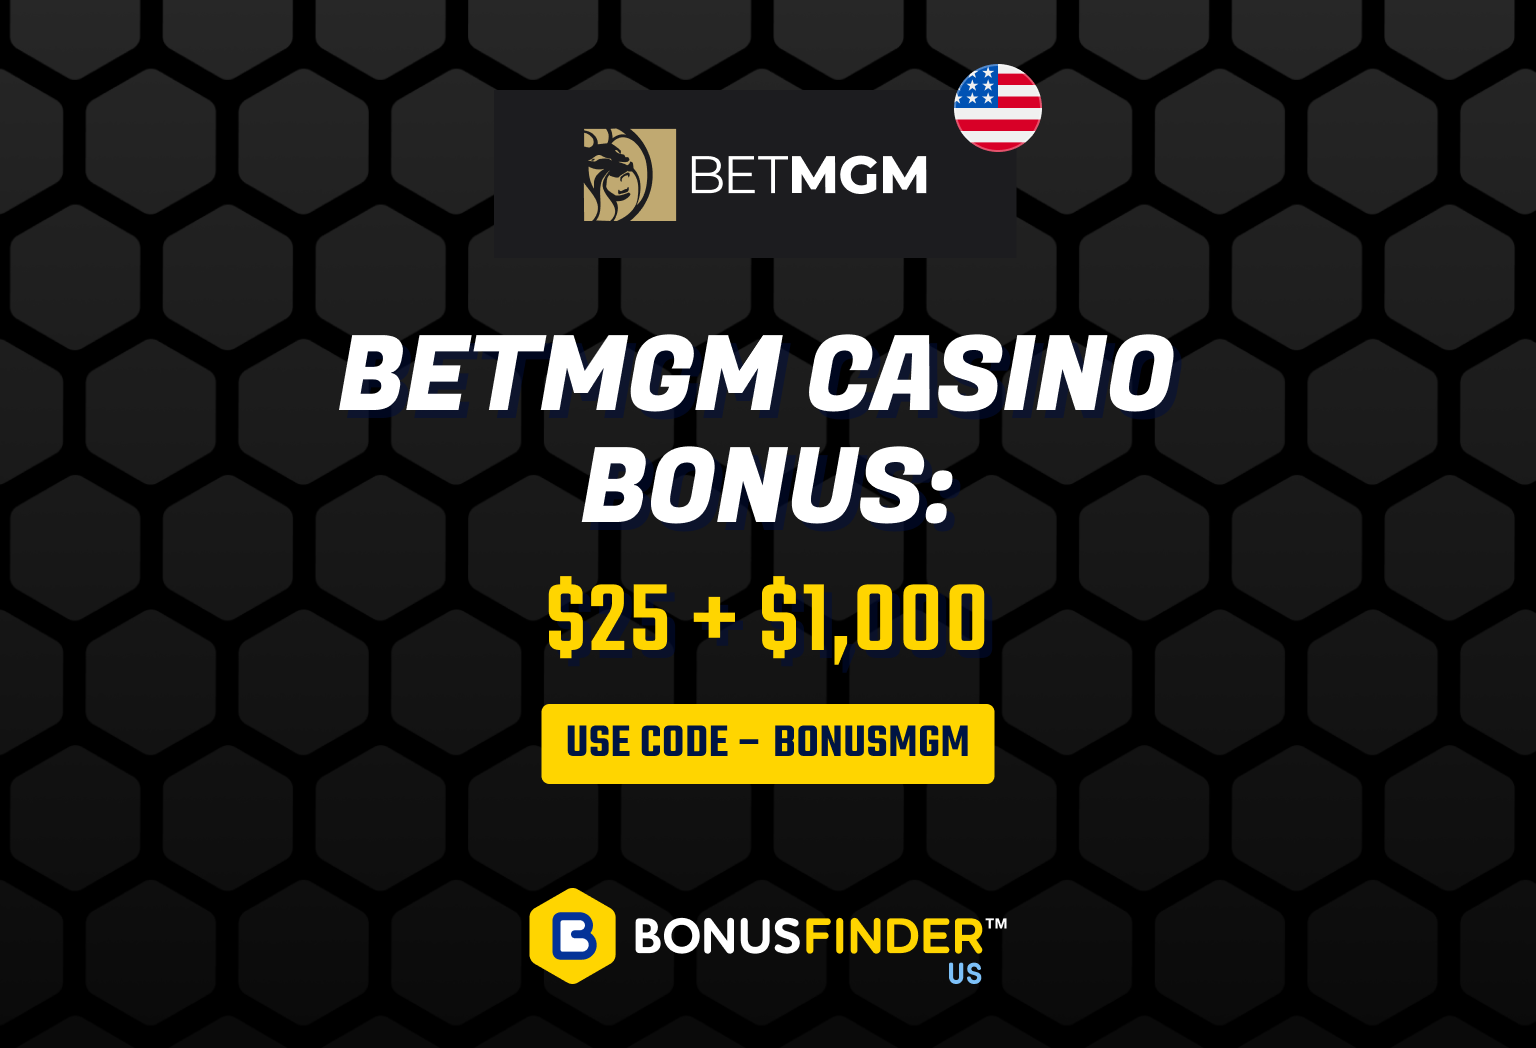 betmgm casino bonus code